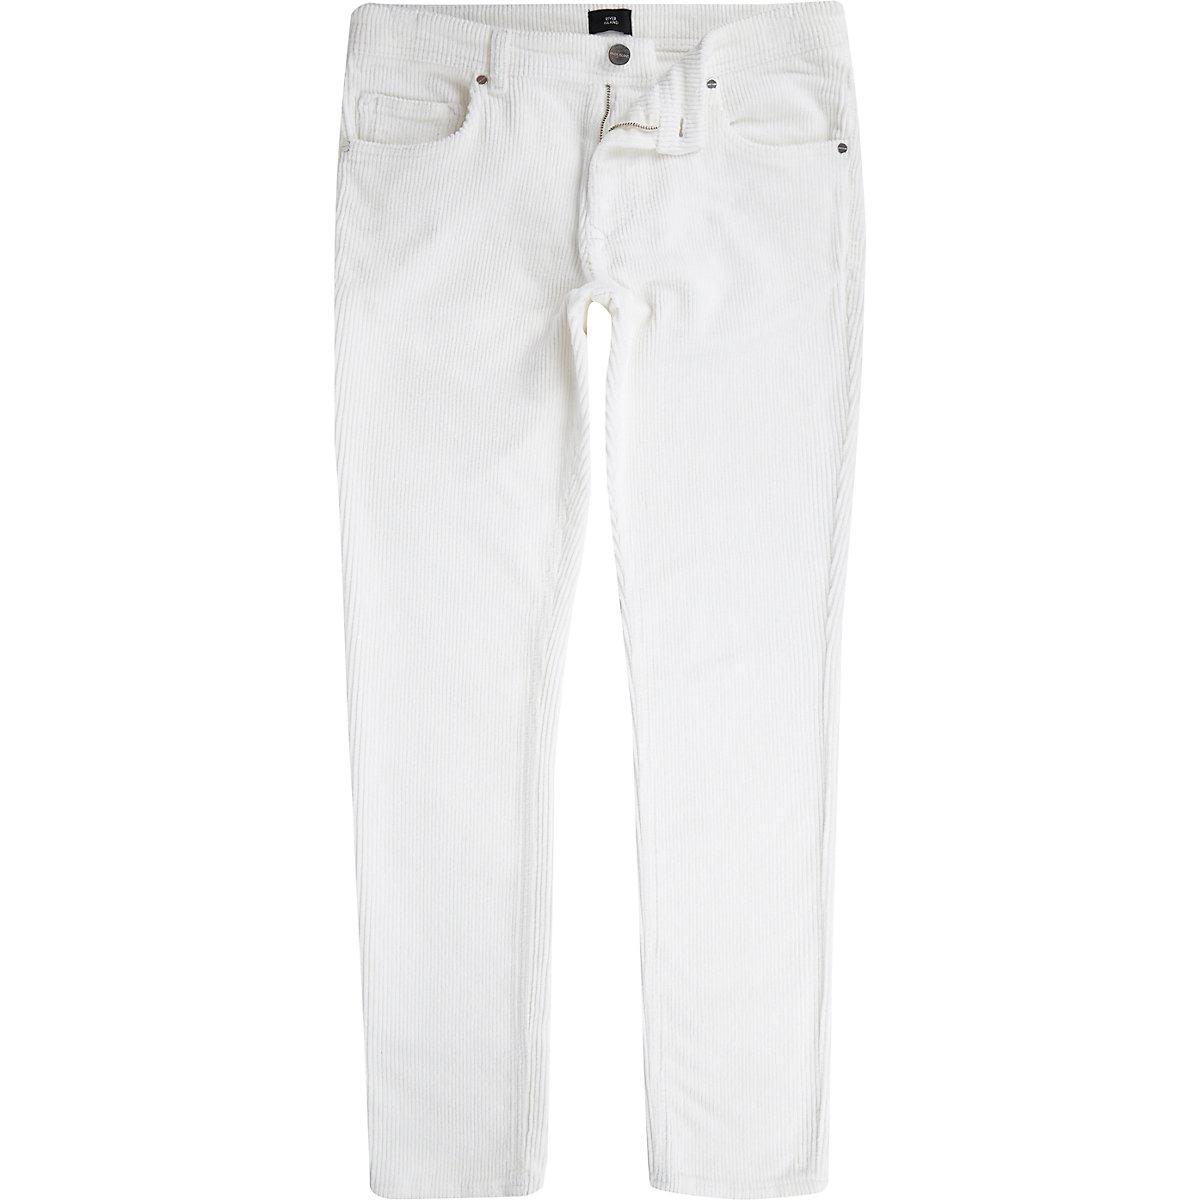 White Sid cord skinny stretch pants